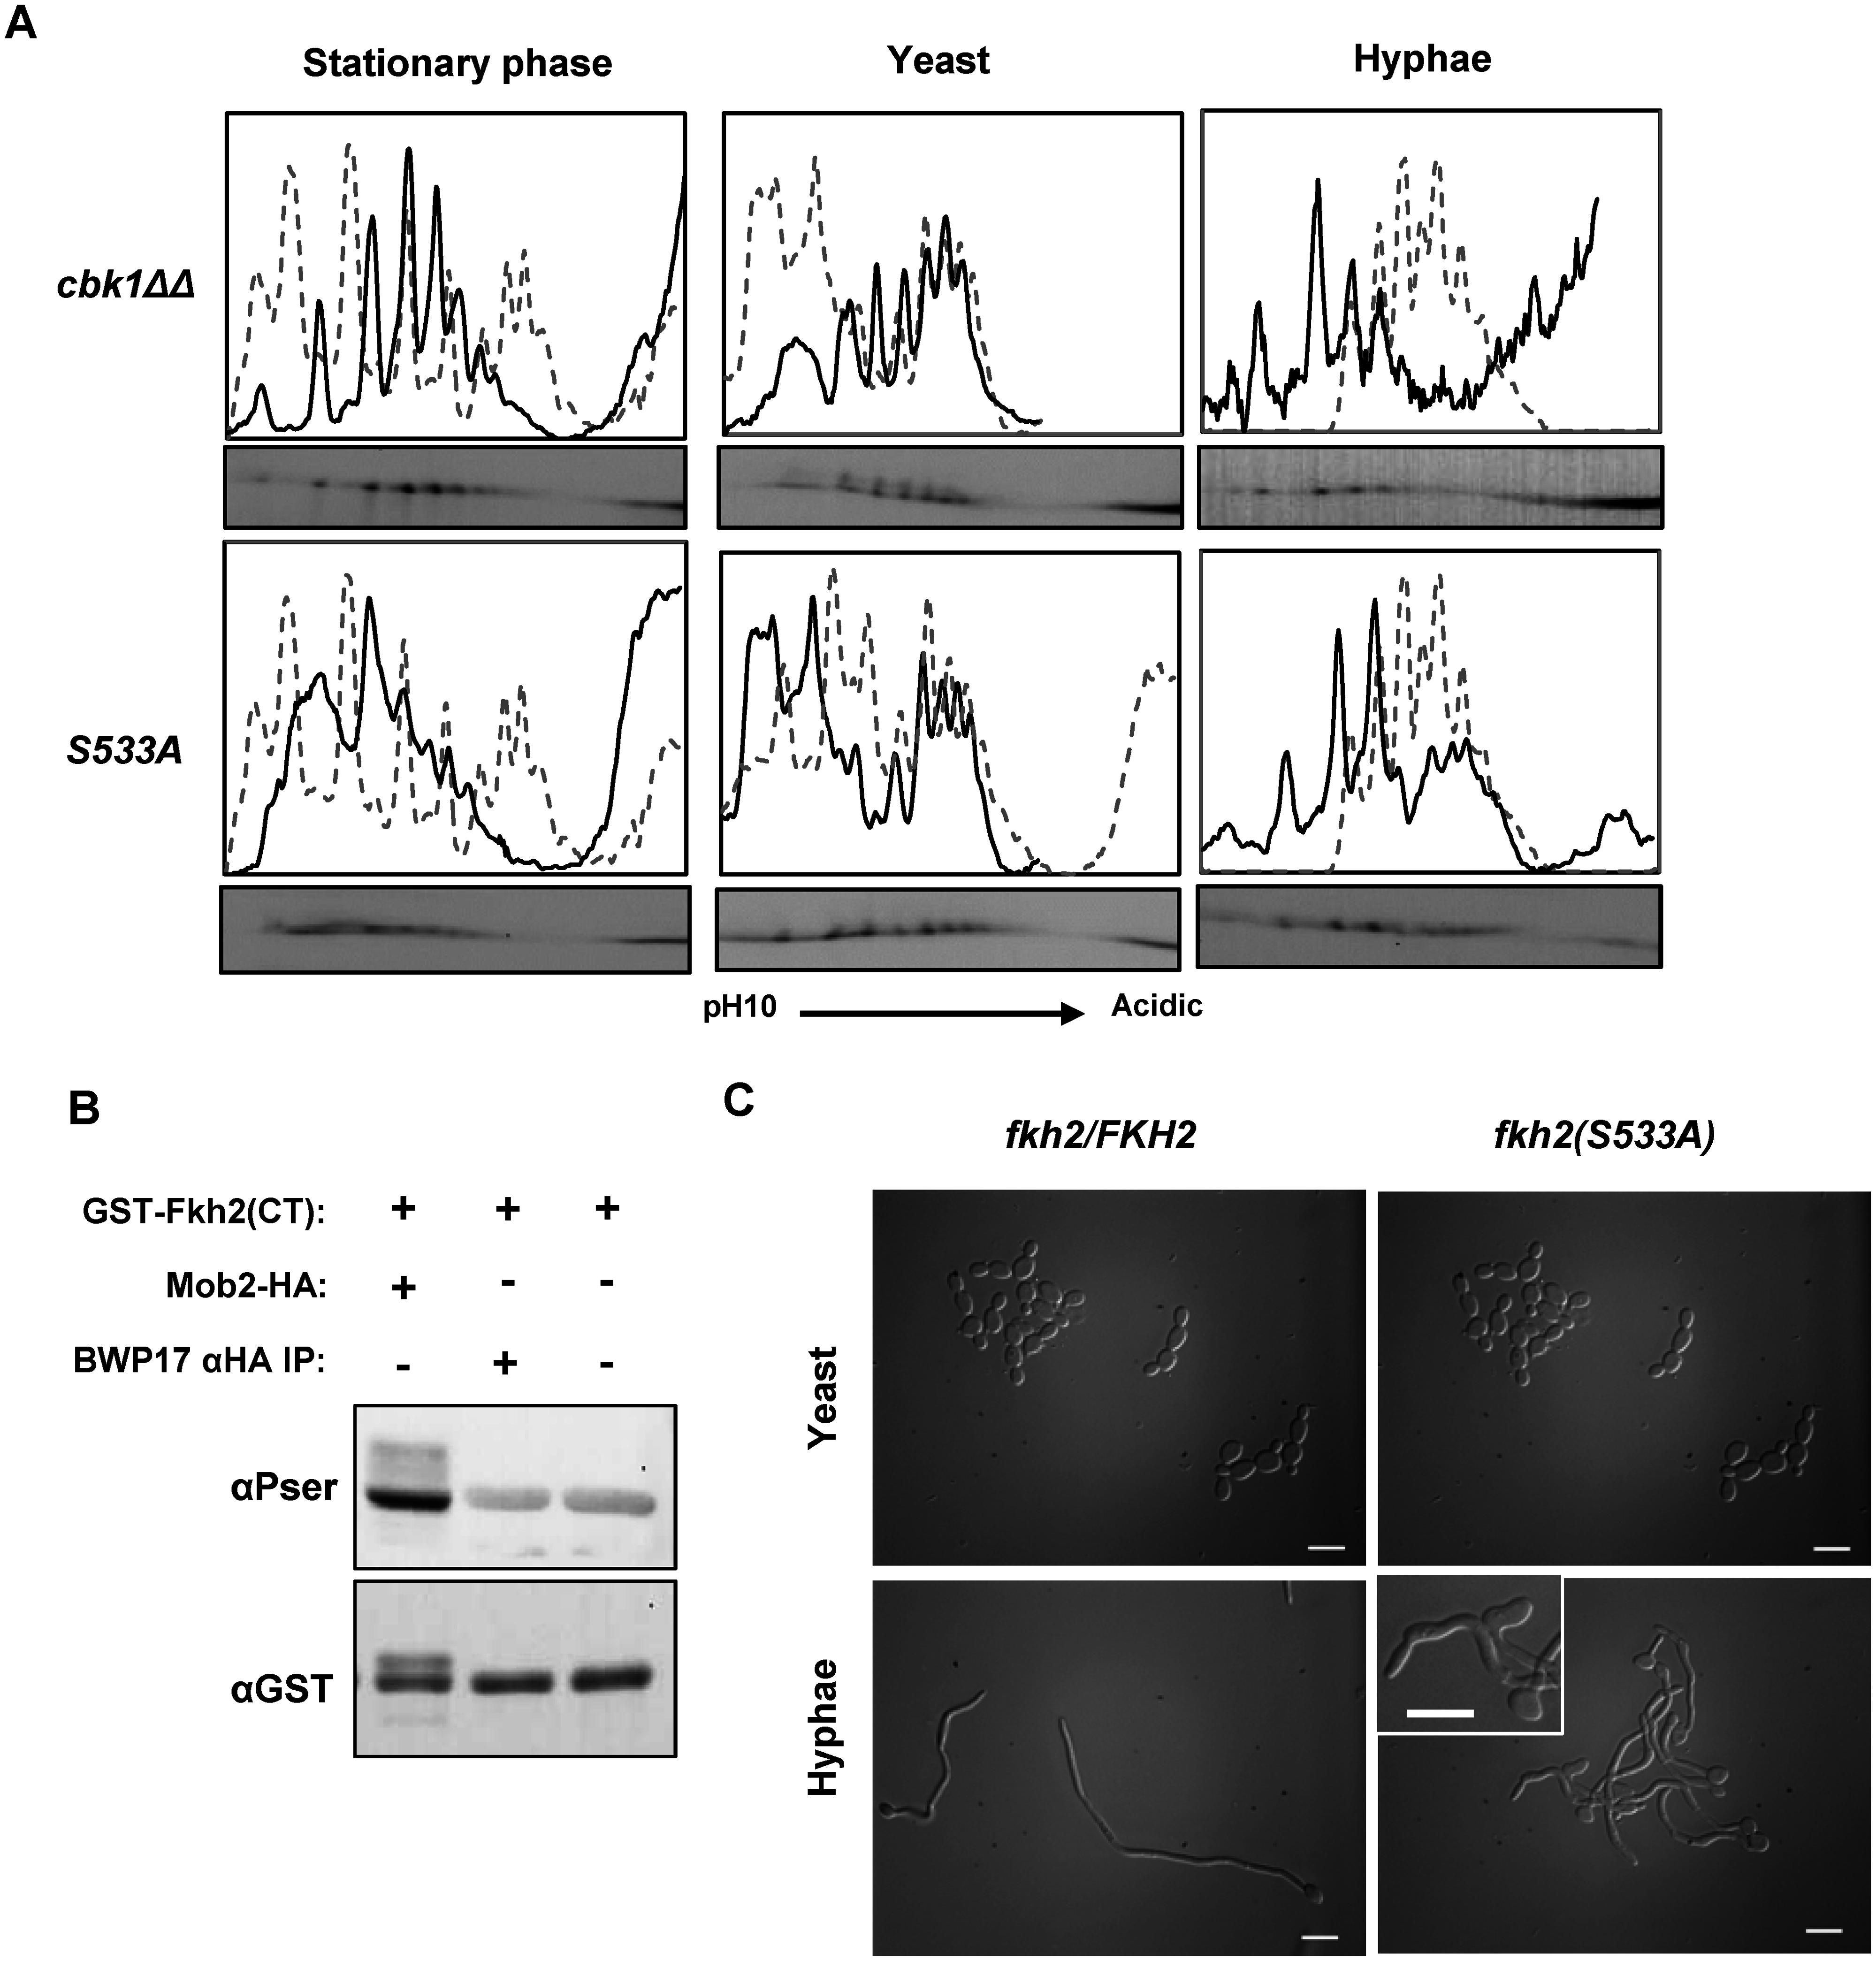 Fkh2 is phosphorylated at serine 533 by Cbk1-Mob2.